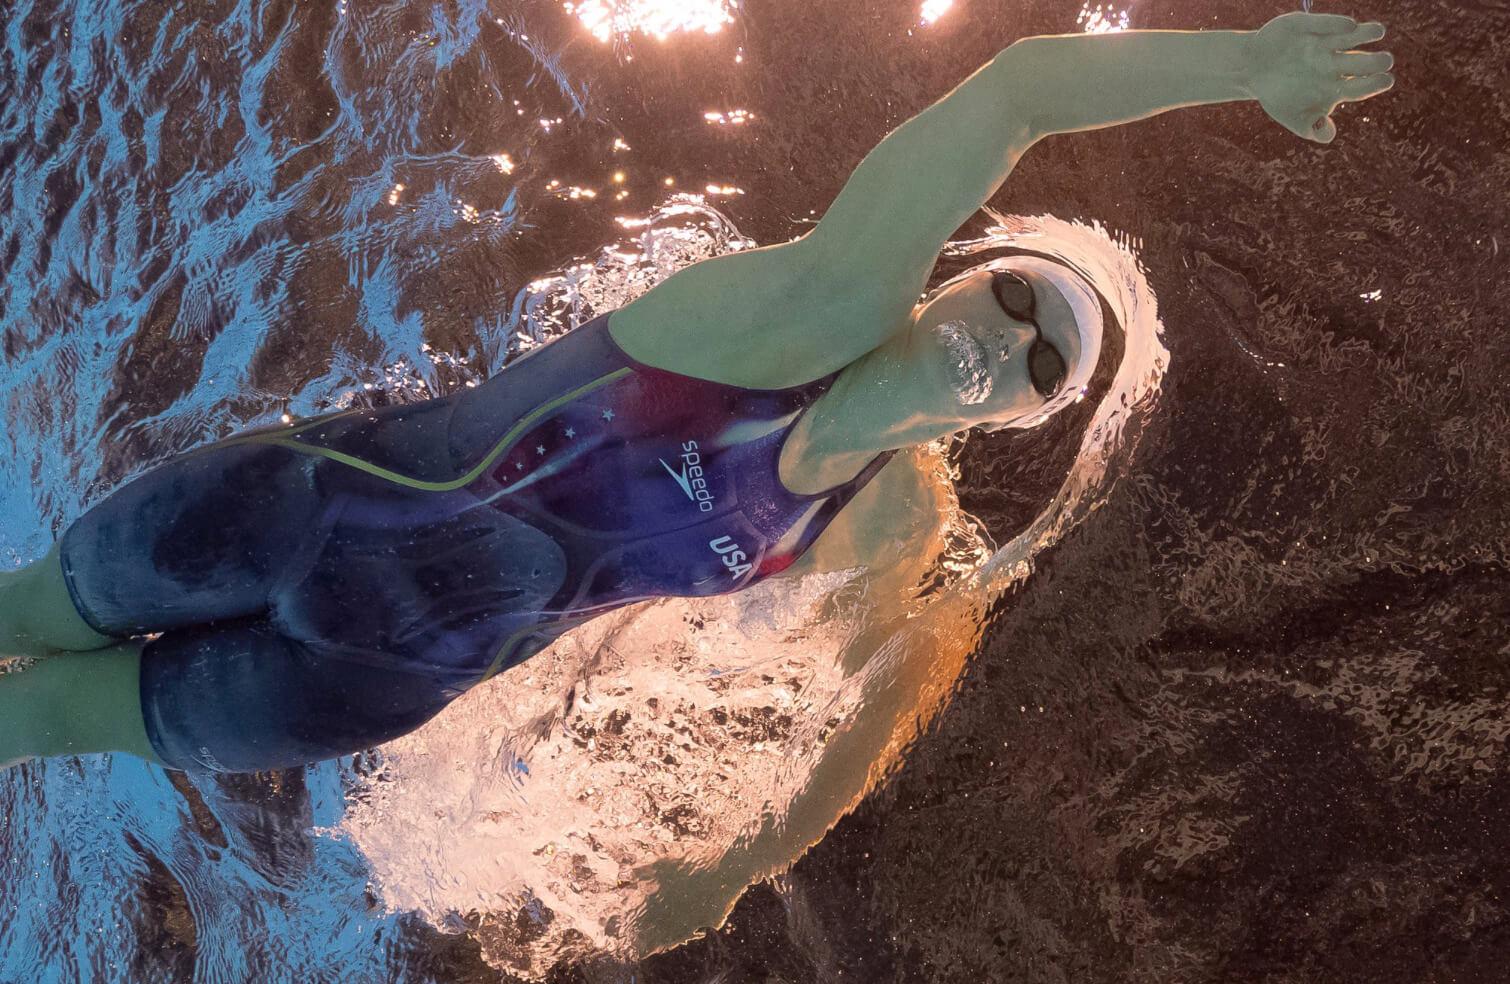 Katie-Ledecky-Michael-Phelps-Rio-2016-1